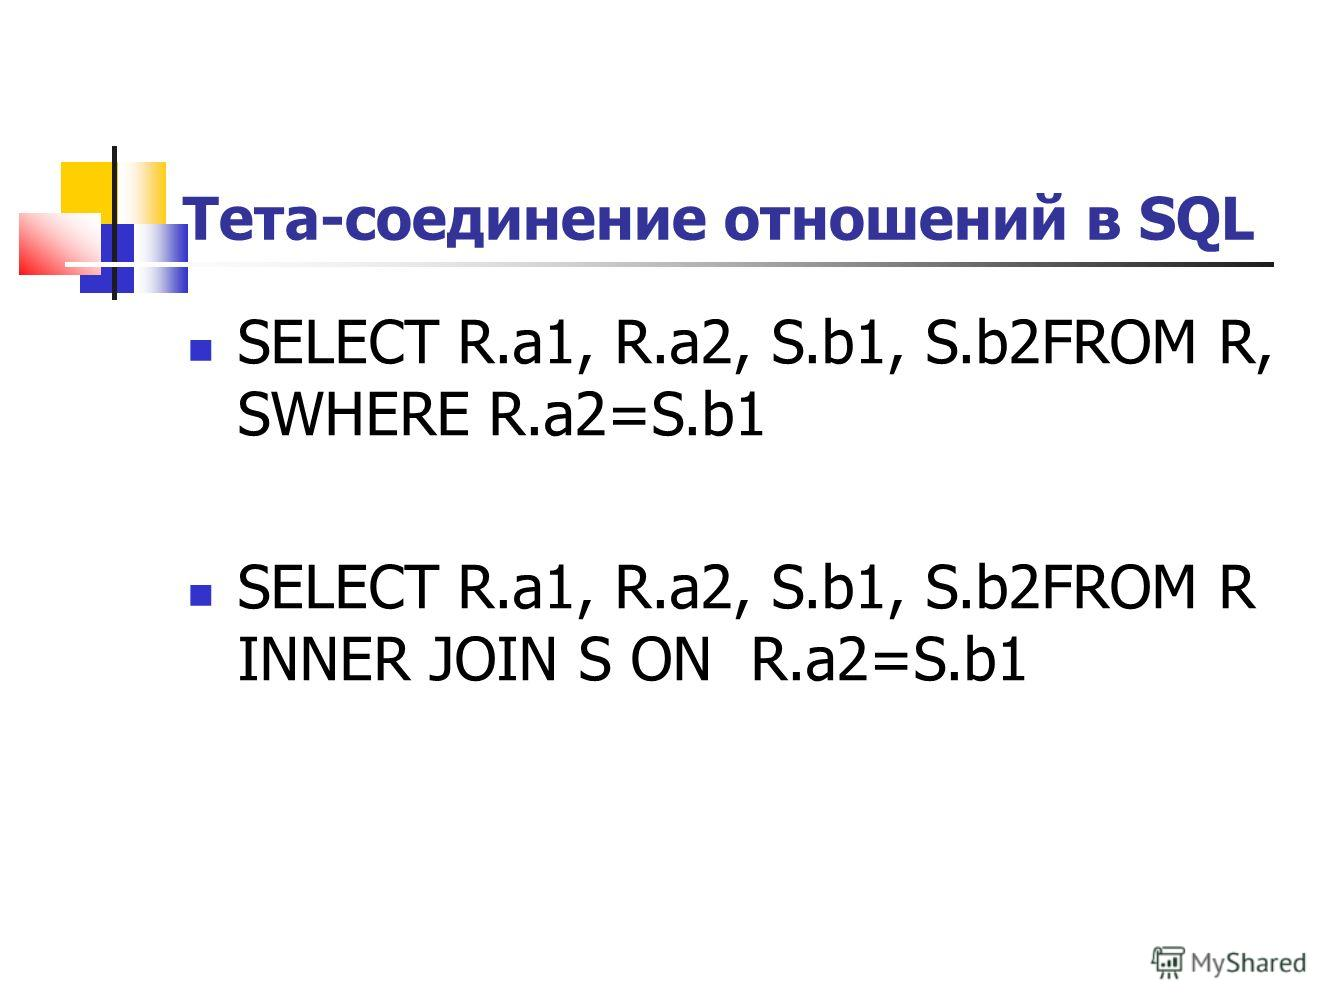 Тета-соединение отношений в SQL SELECT R.a1, R.a2, S.b1, S.b2FROM R, SWHERE R.a2=S.b1 SELECT R.a1, R.a2, S.b1, S.b2FROM R INNER JOIN S ON R.a2=S.b1